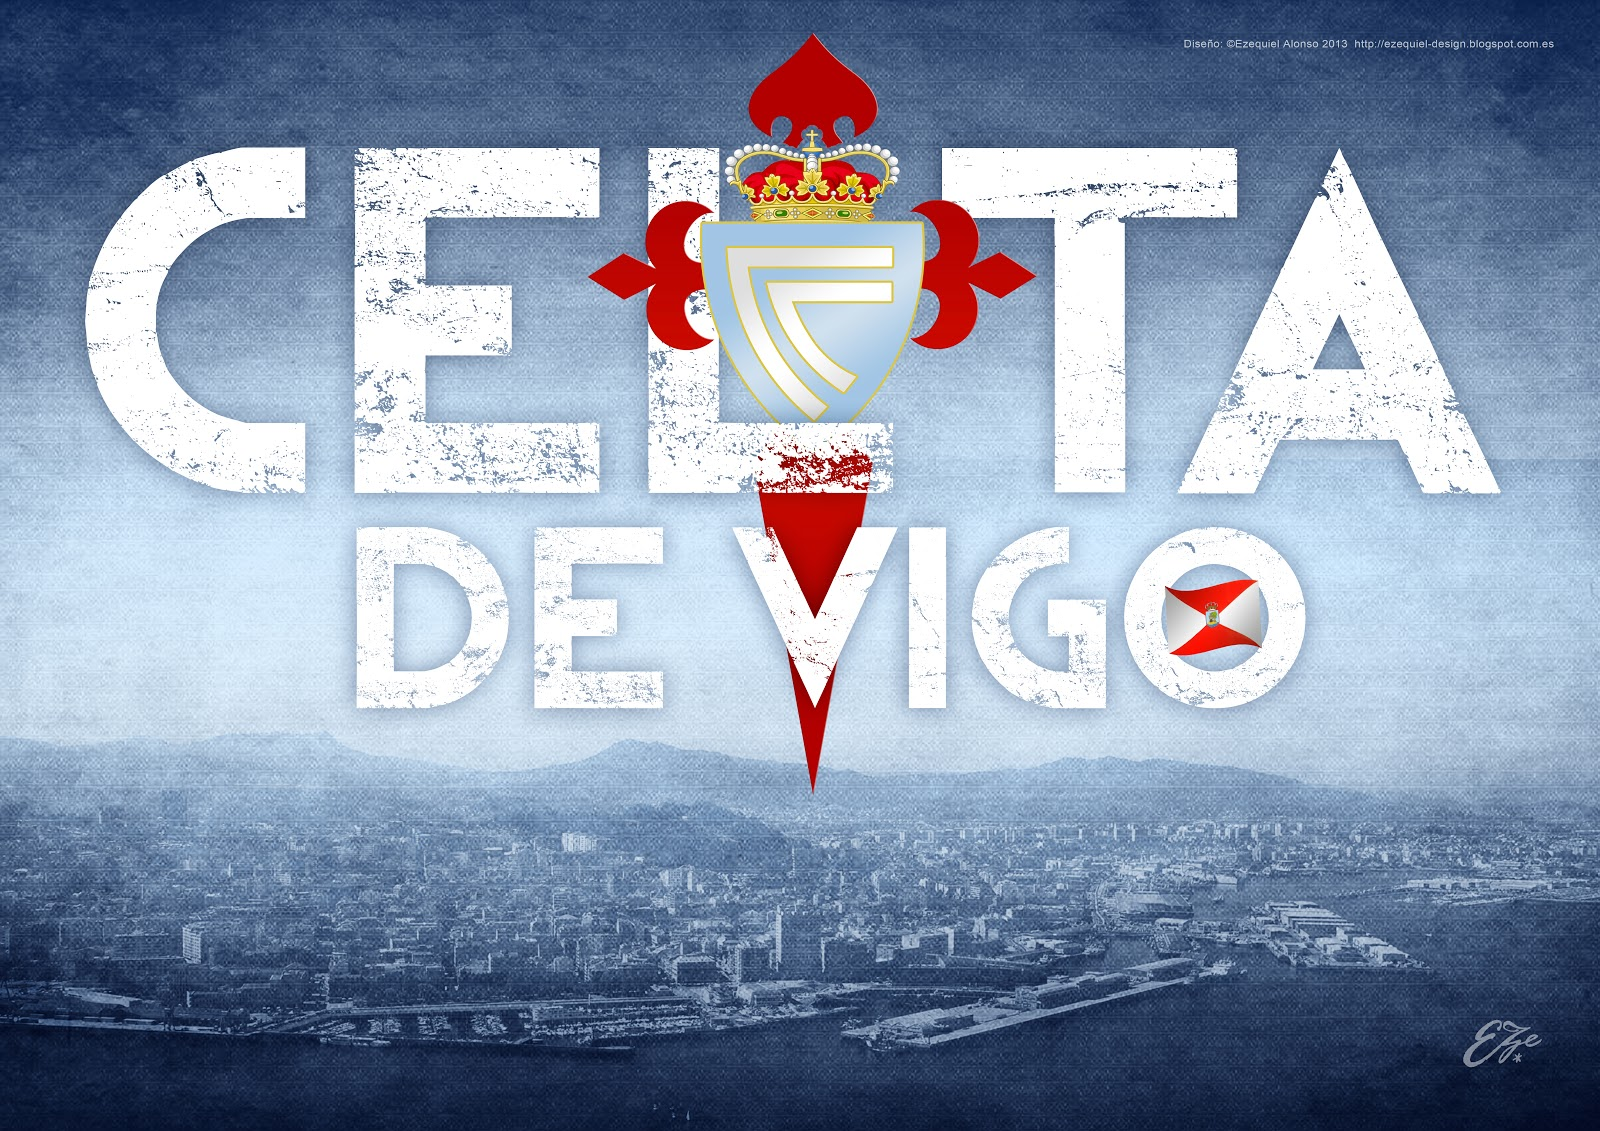 Wallpaper Celta de Vigo Eze 2013 Radio Sporting 1600x1131